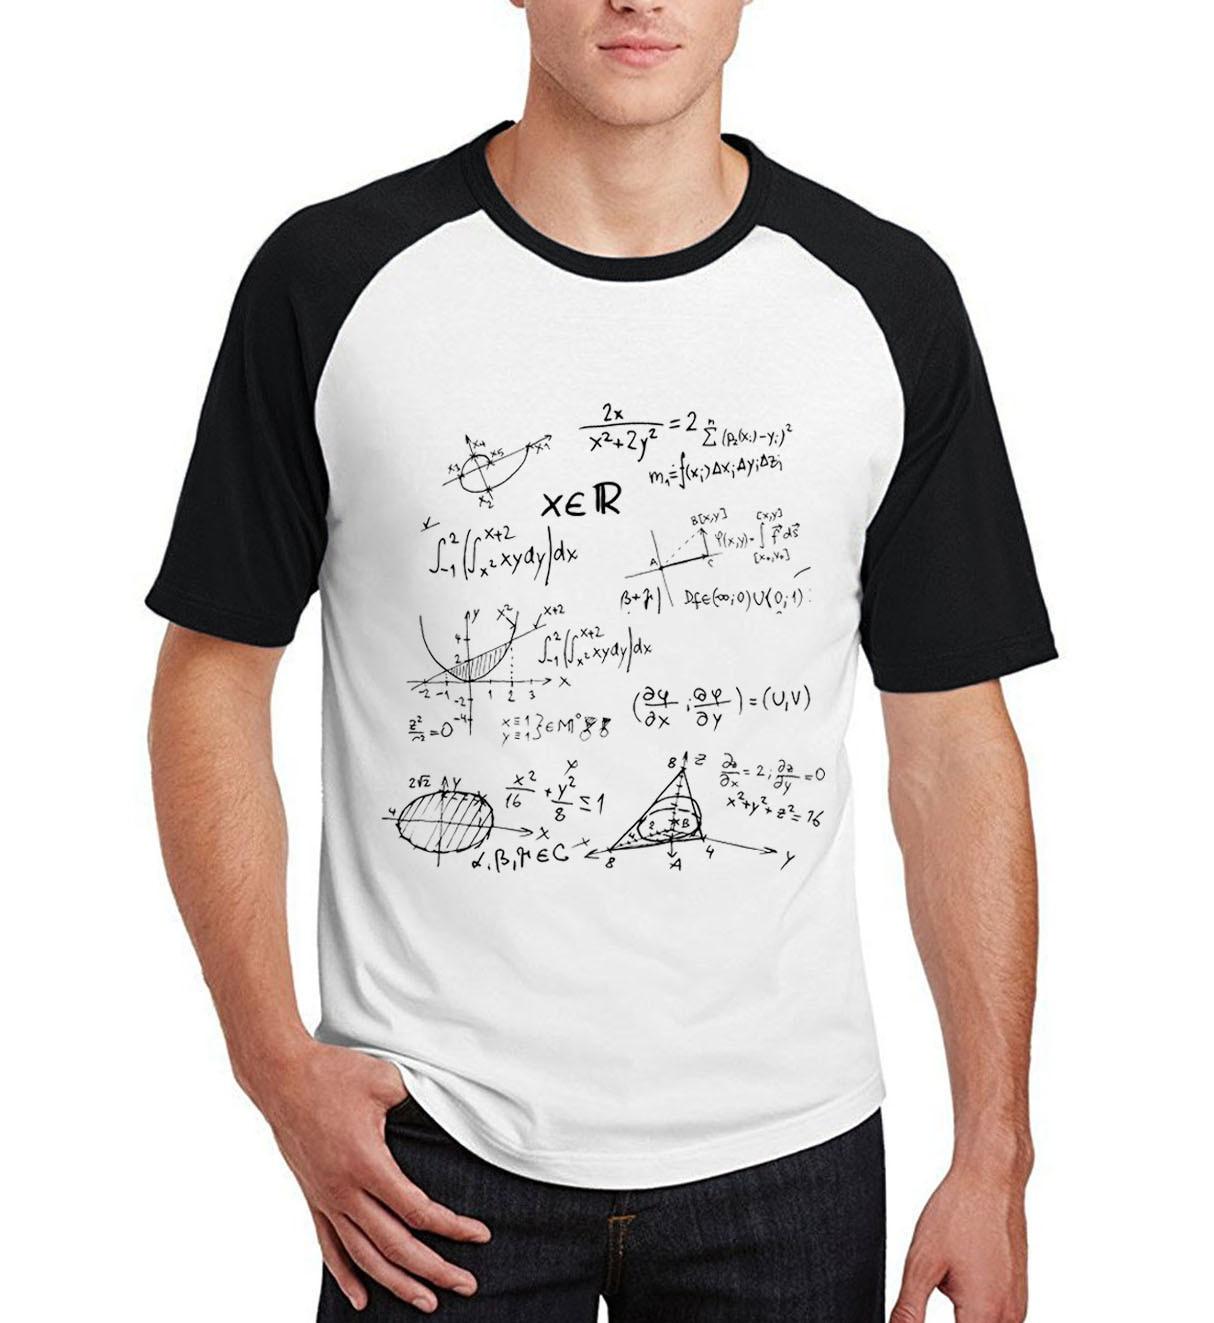 2019 summer Mathematical formula camisetas men casual hip-hop cotton t shirt hipster raglan short sleeve Big Bang Theory clothes